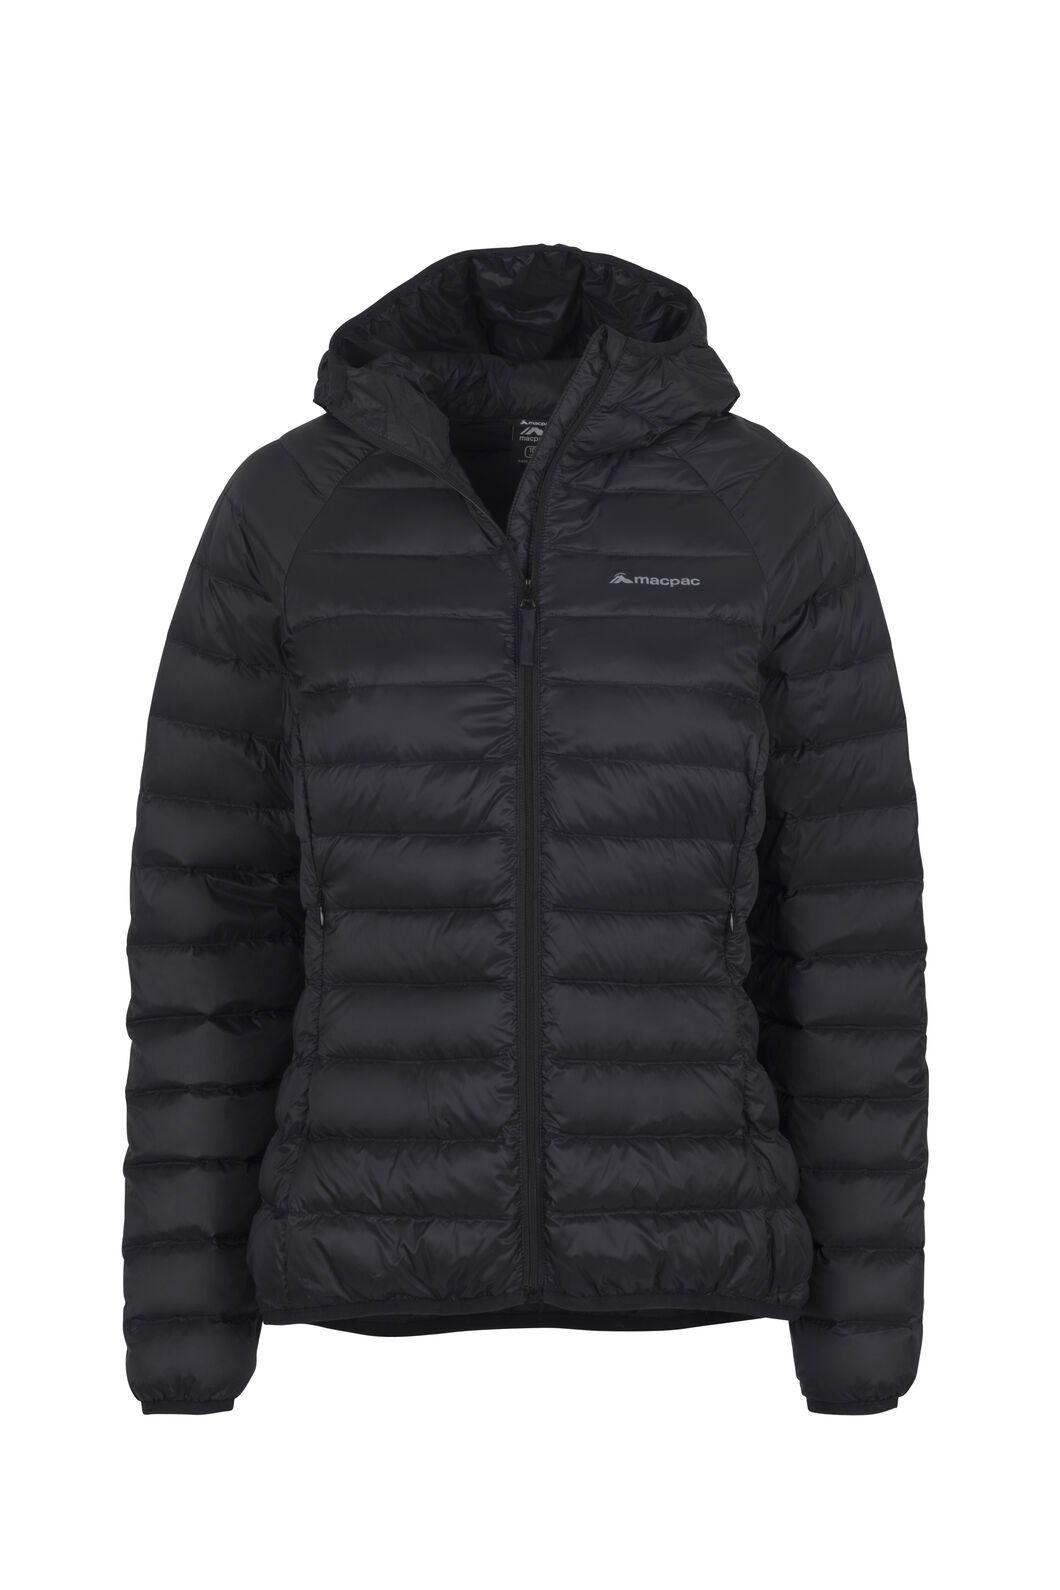 Macpac Uber Light Hooded Jacket - Women's, Black, hi-res